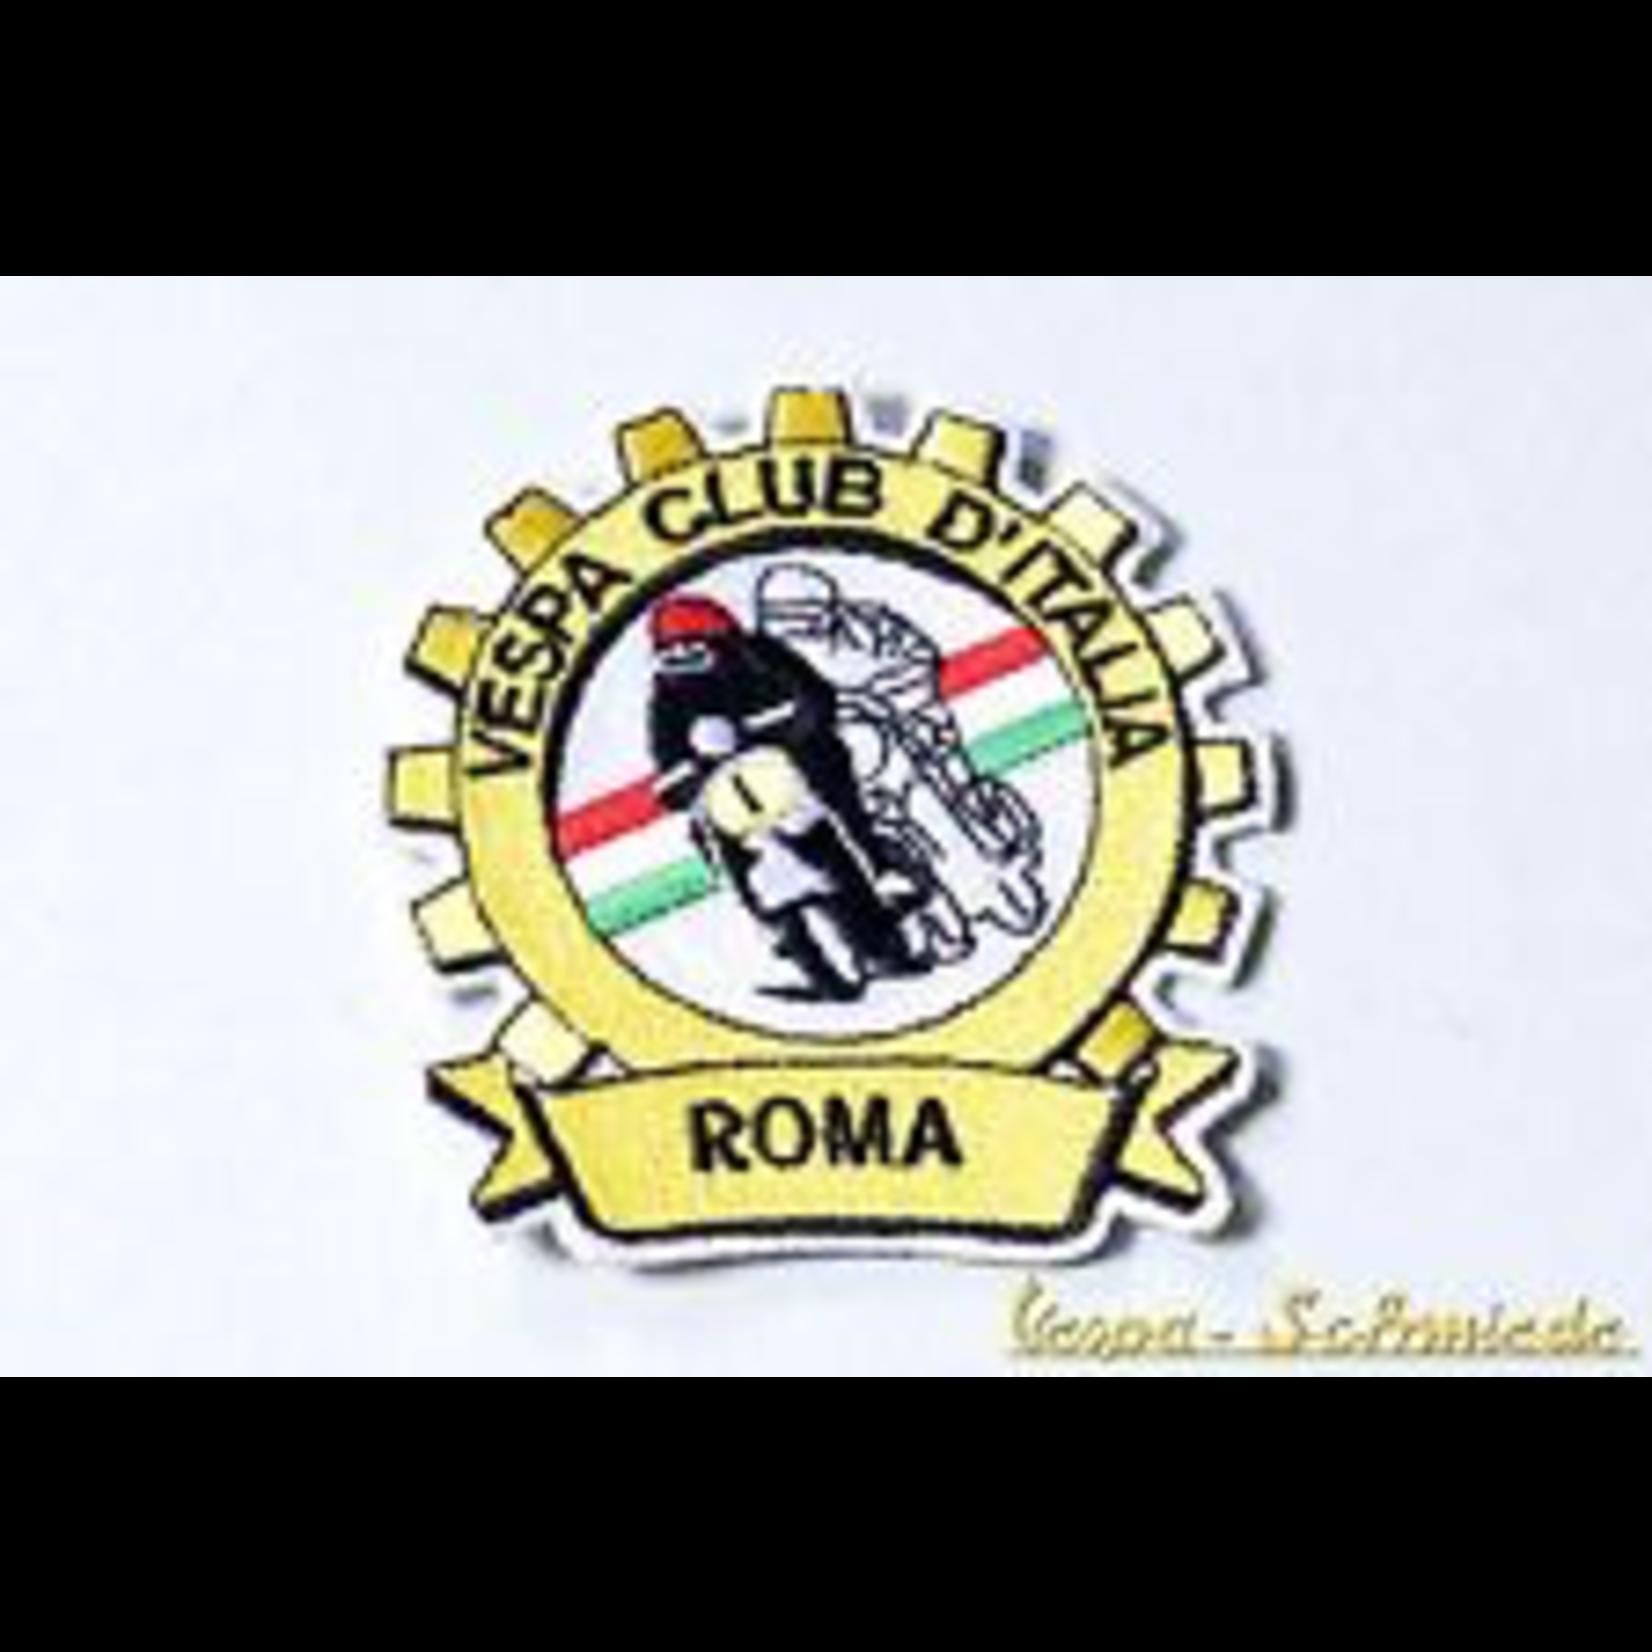 Lifestyle Patch, Vespa Club of Roma